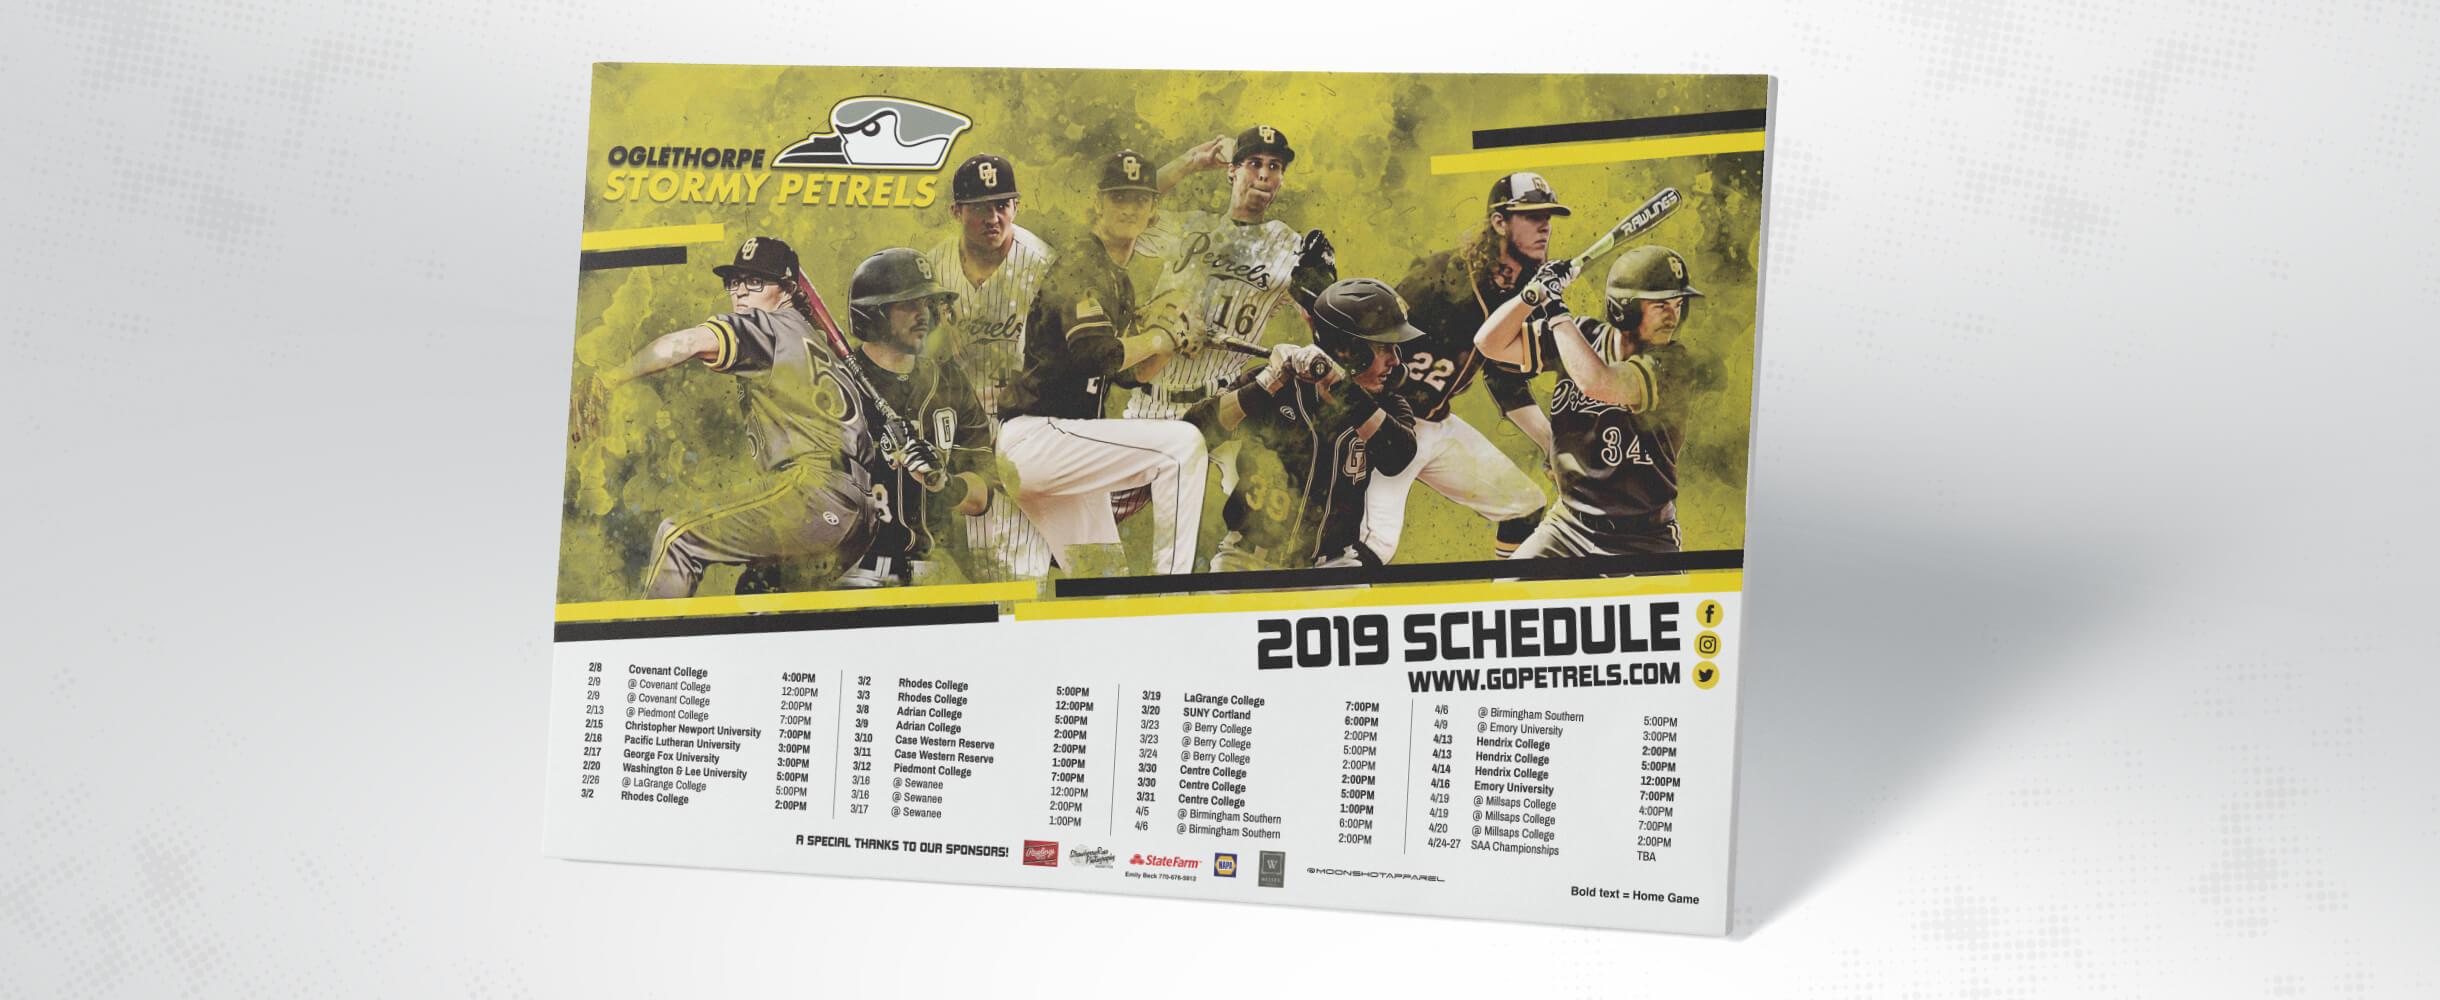 oglethorpe university baseball schedule poster